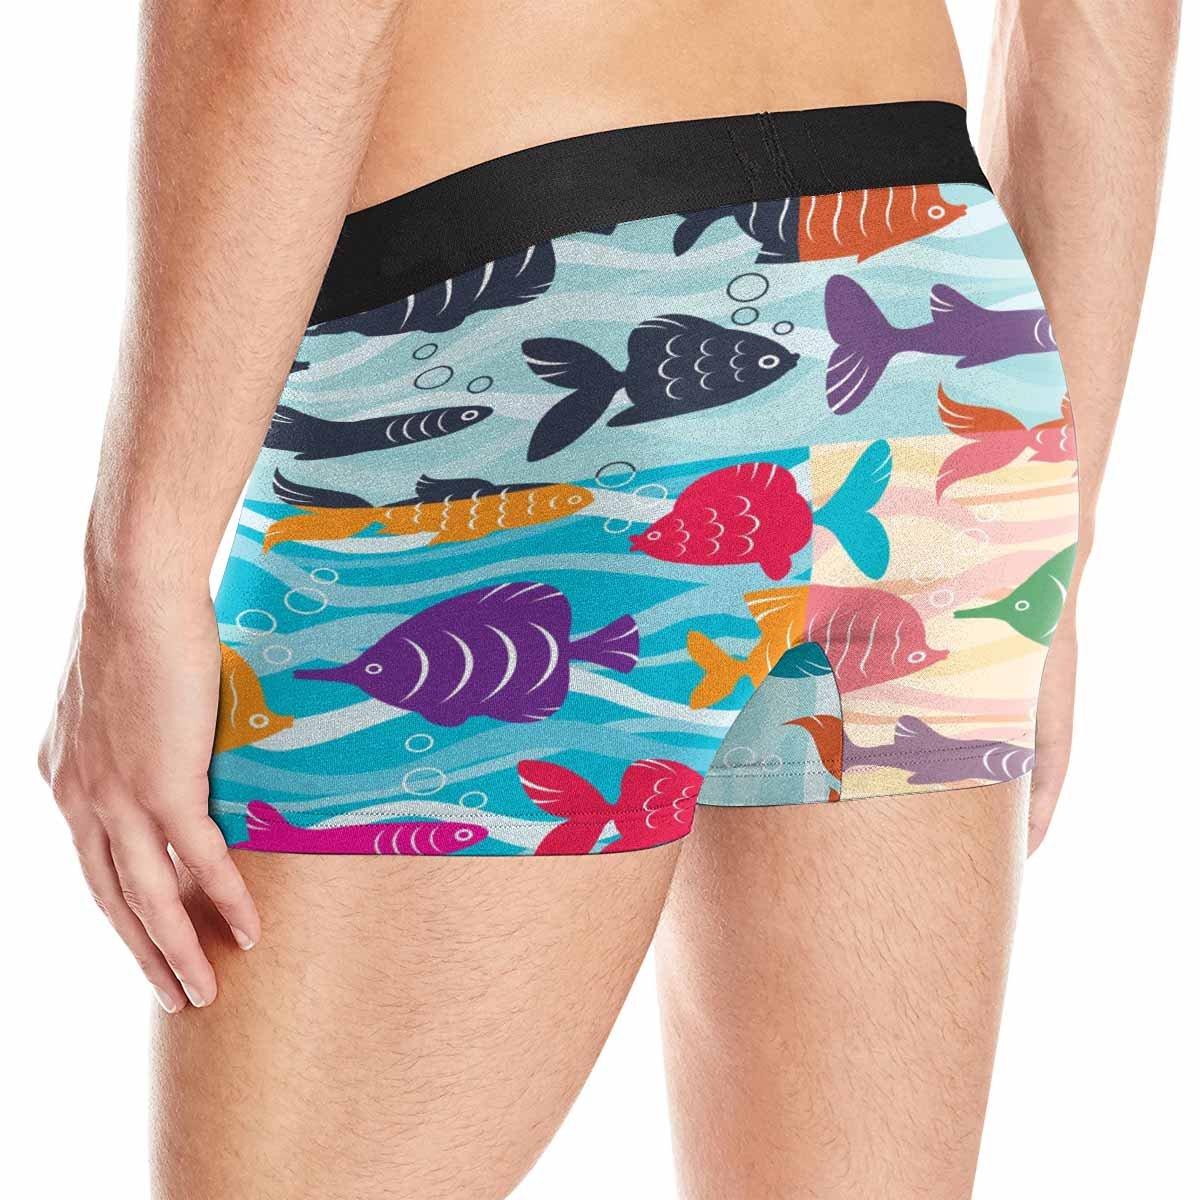 INTERESTPRINT Boxer Briefs Mens Underwear Colorful Bright Fish Stock XS-3XL